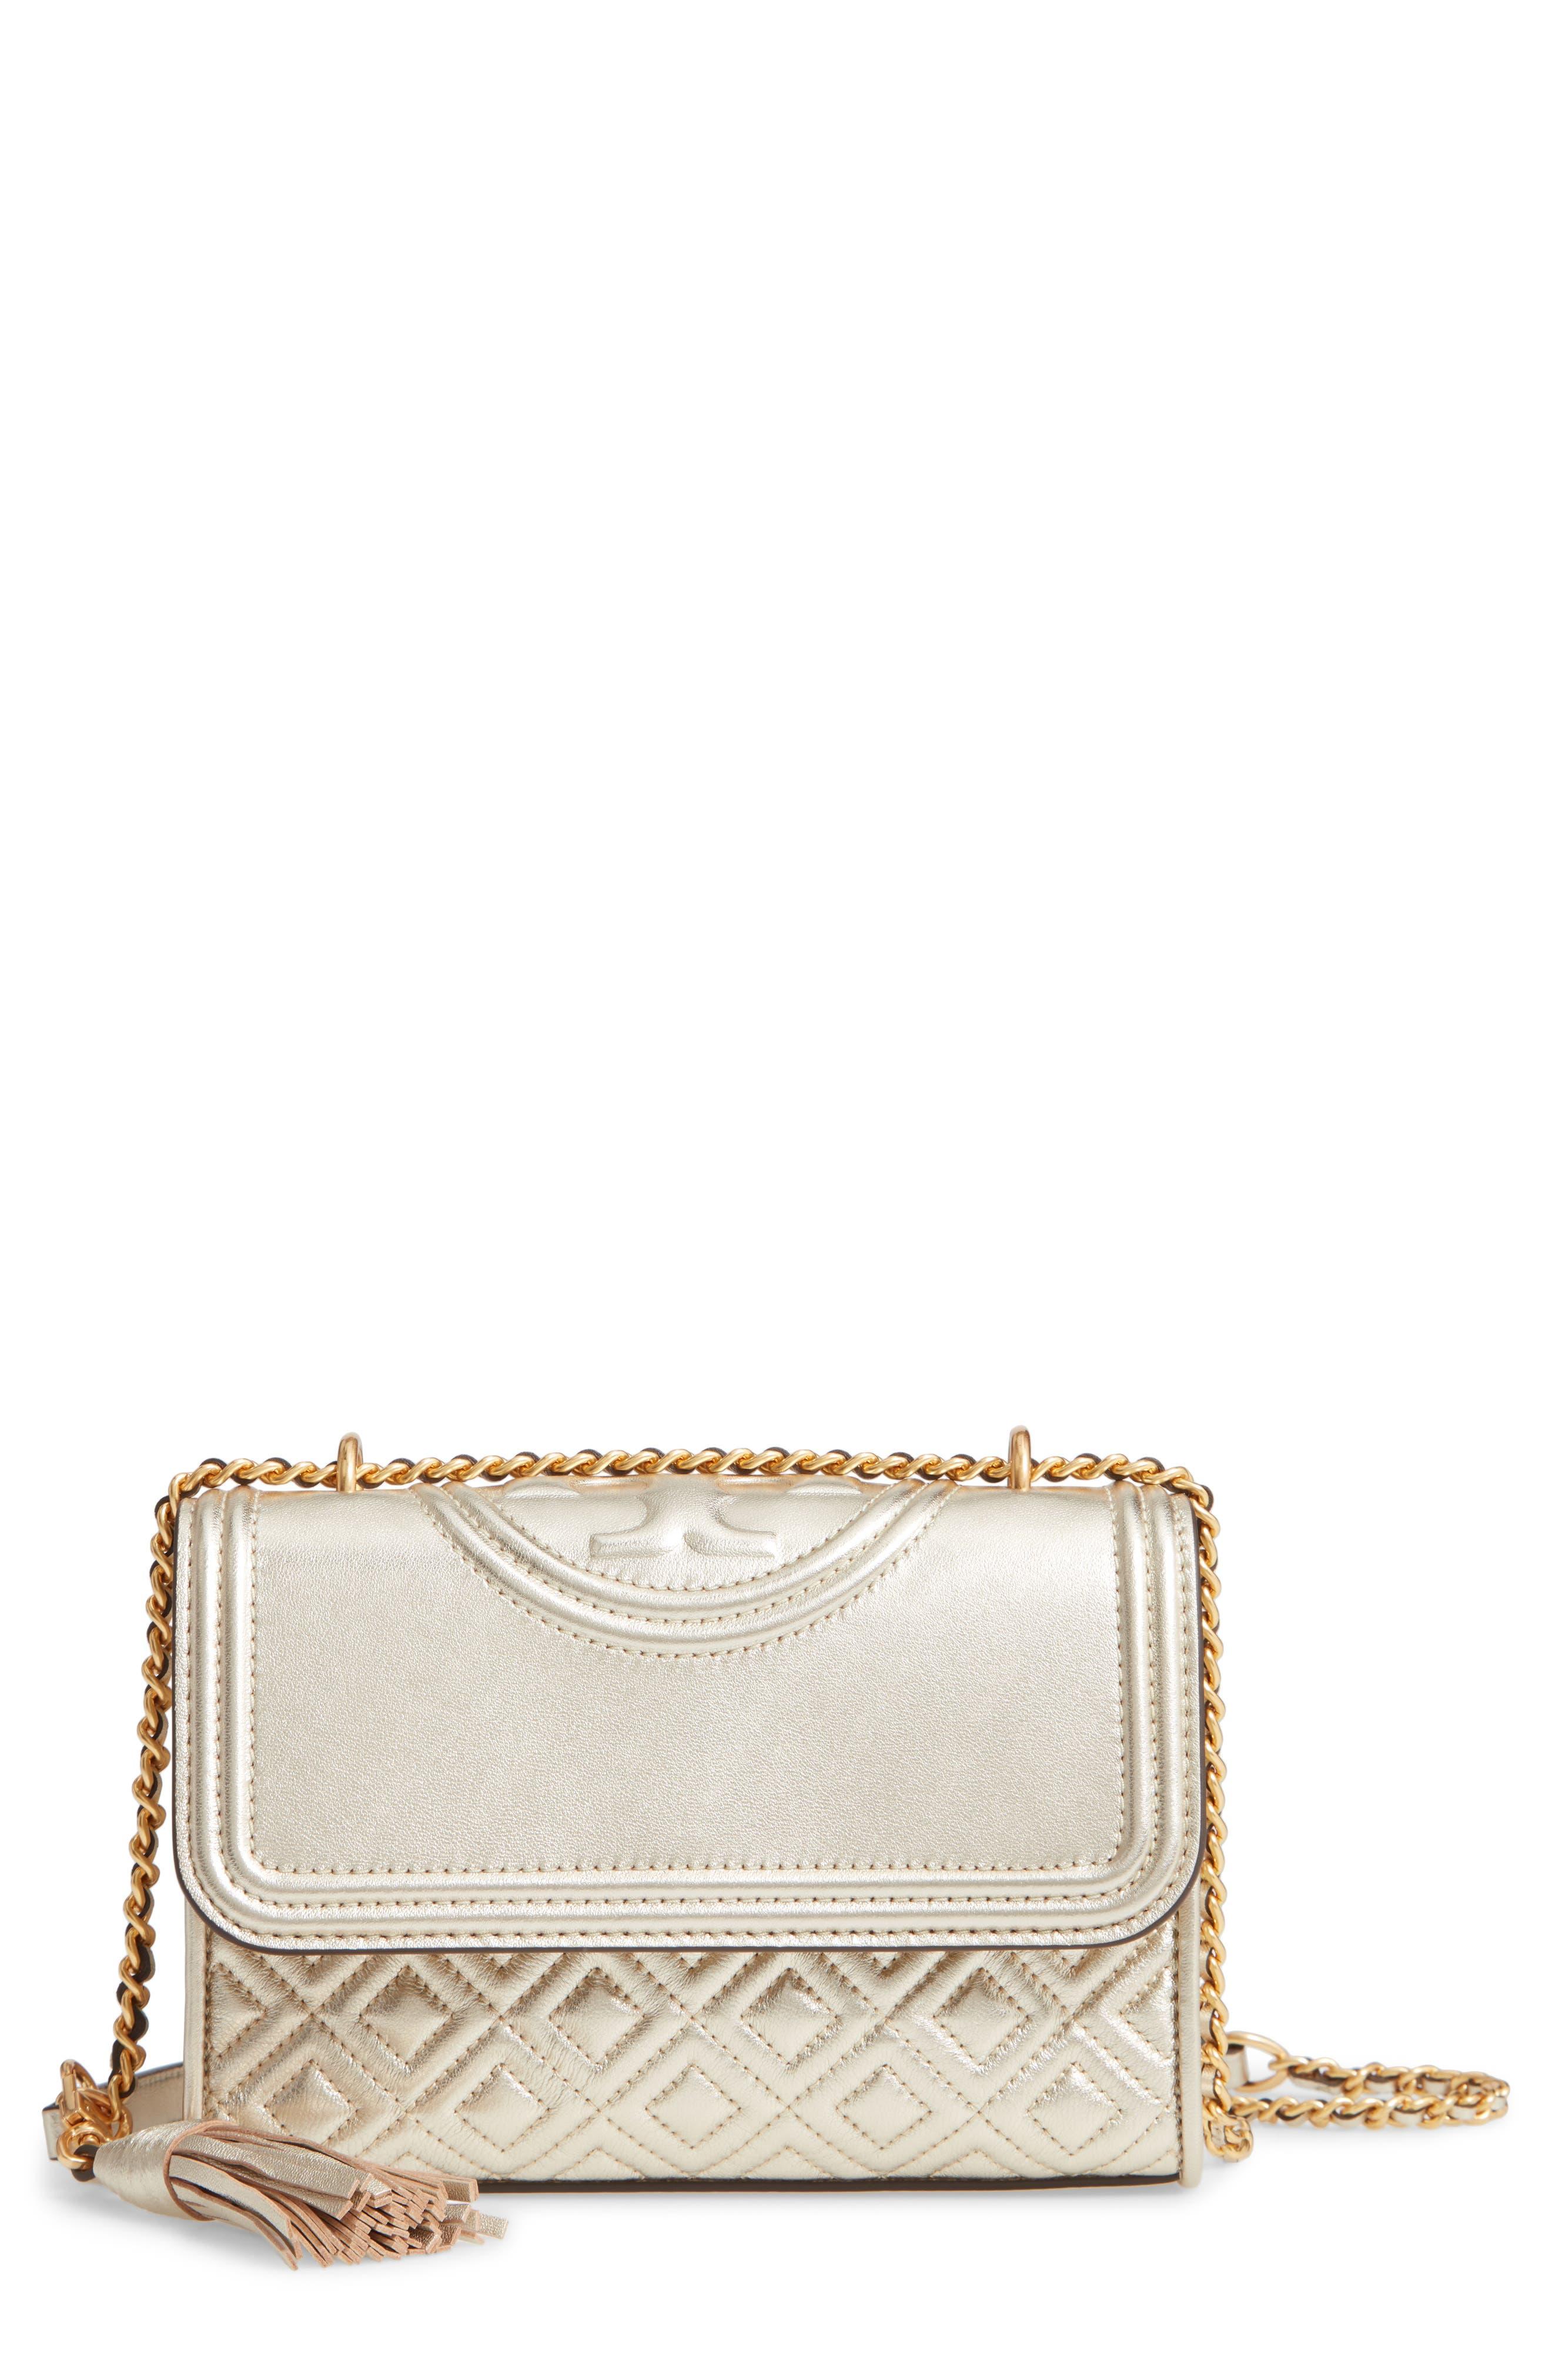 TORY BURCH Small Fleming Metallic Lambskin Leather Convertible Shoulder Bag, Main, color, 100